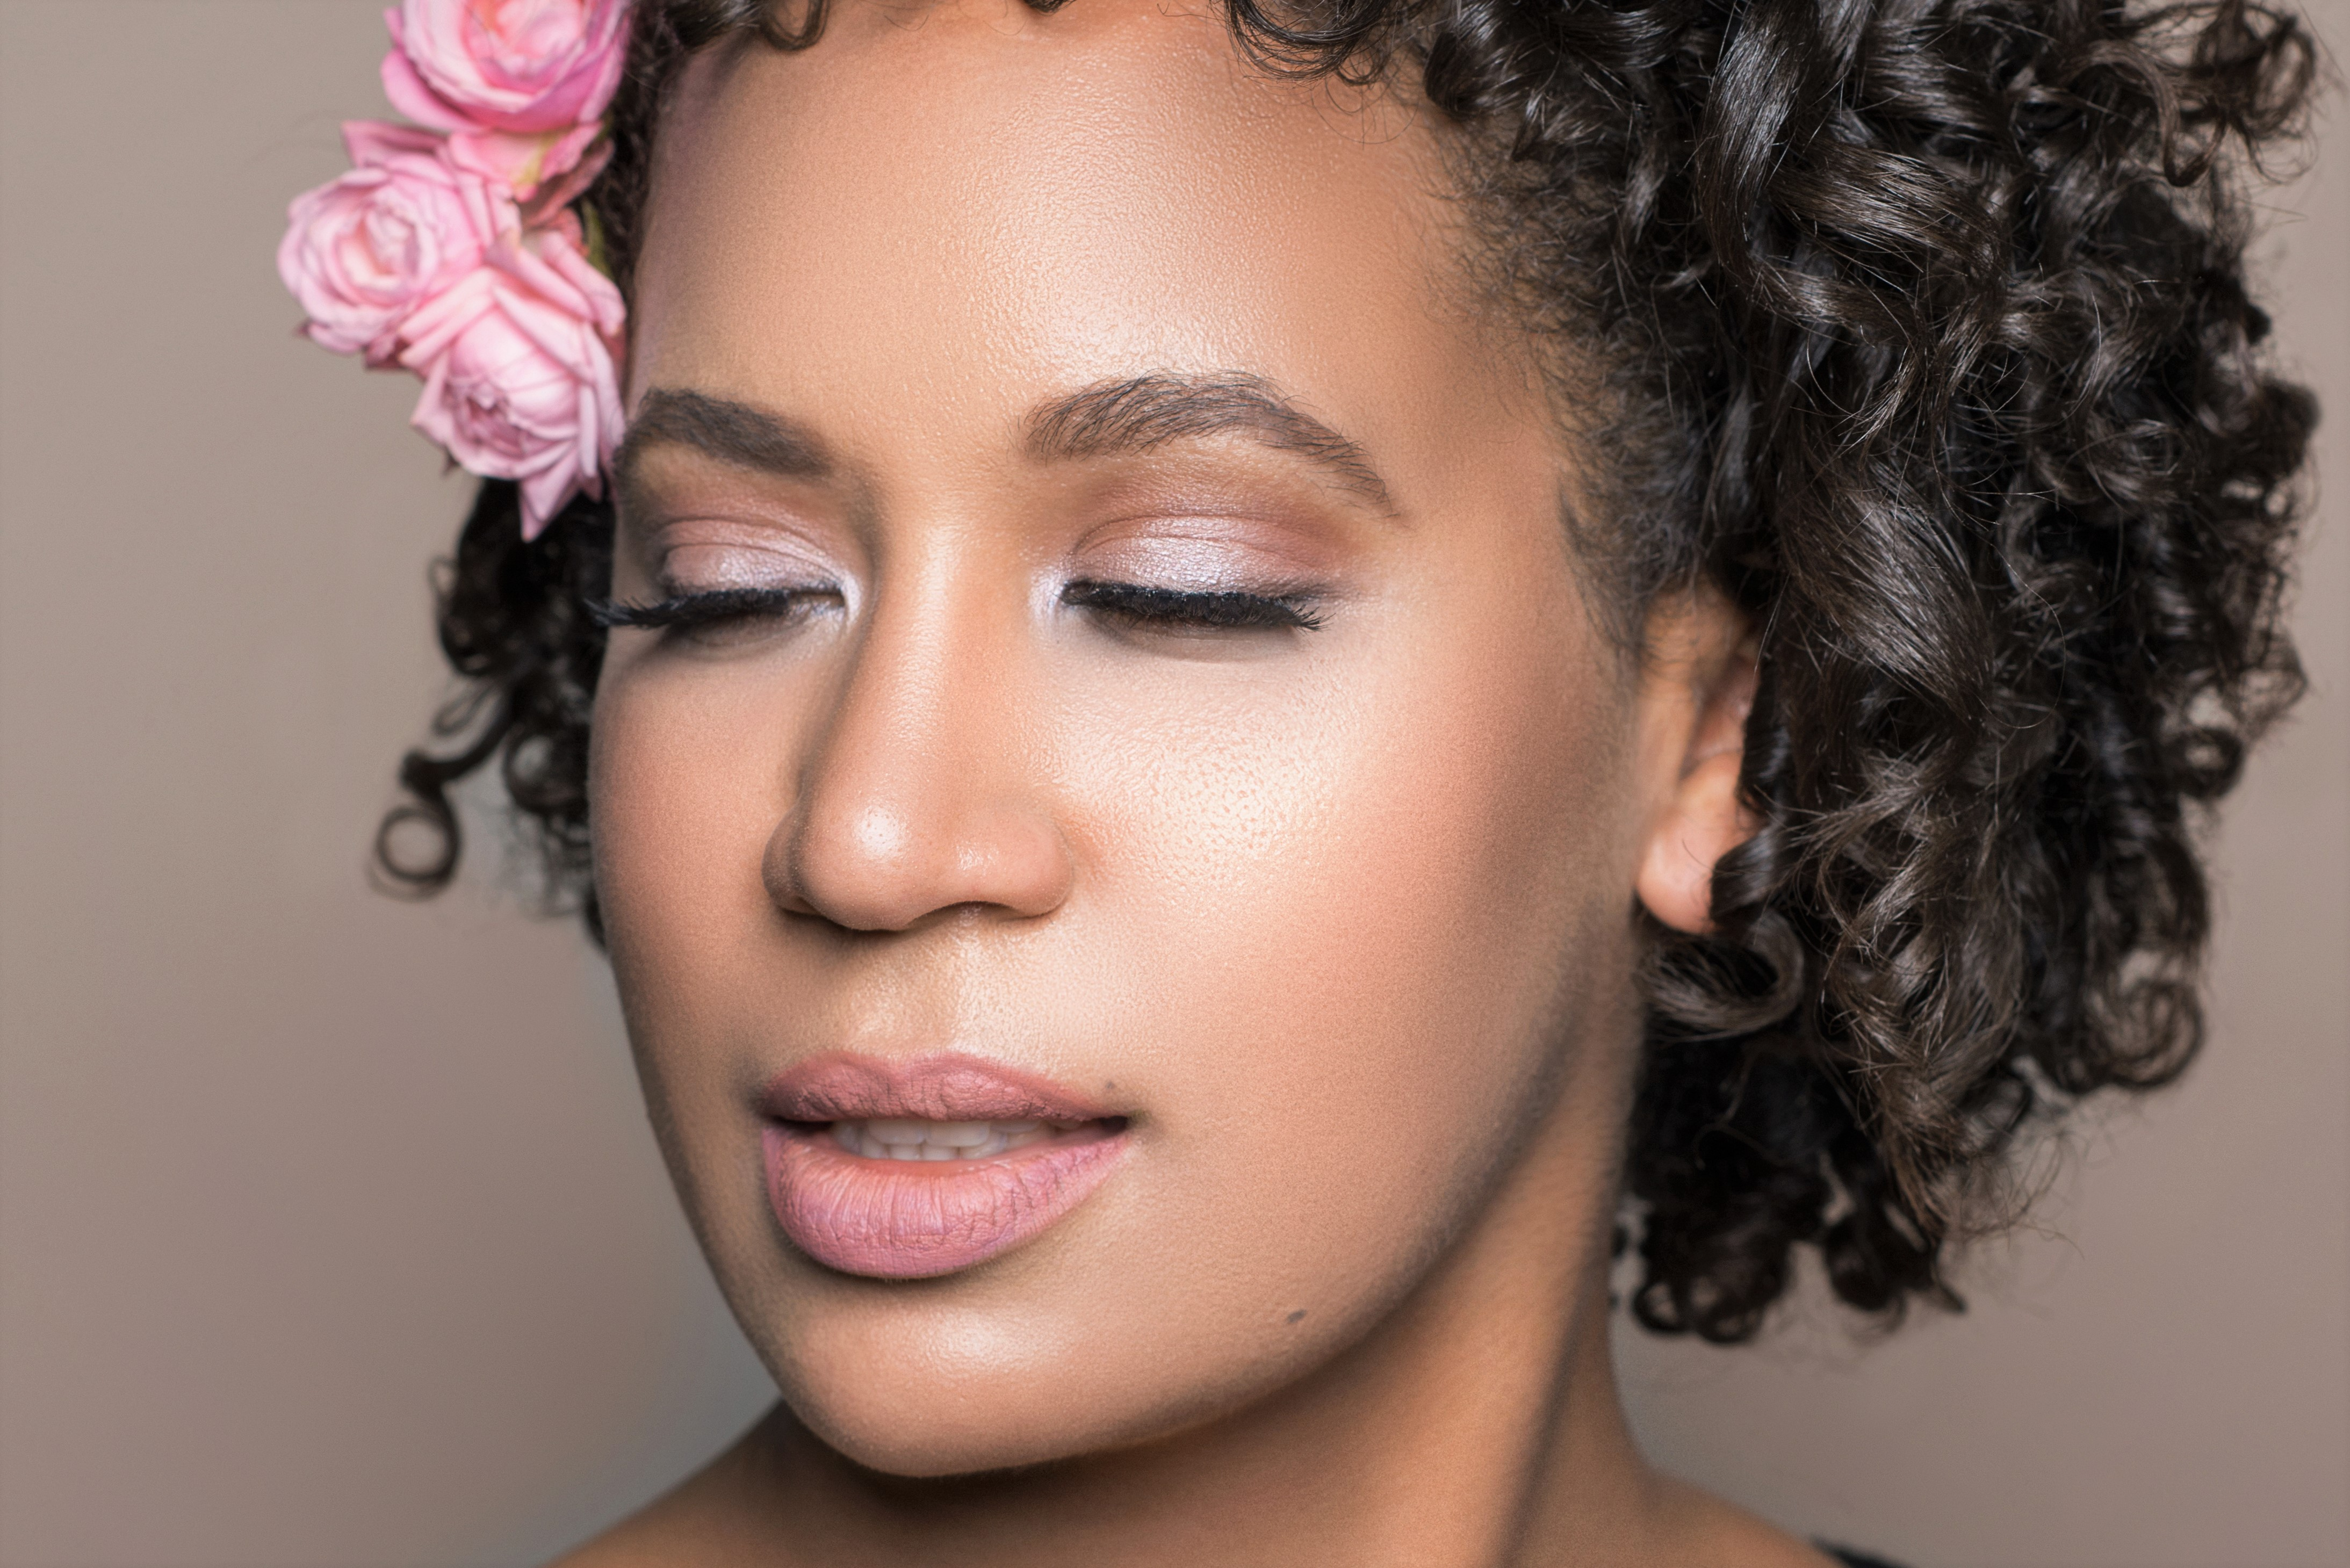 natural-black-bride-makeup-hair-curls-flowers-pink-